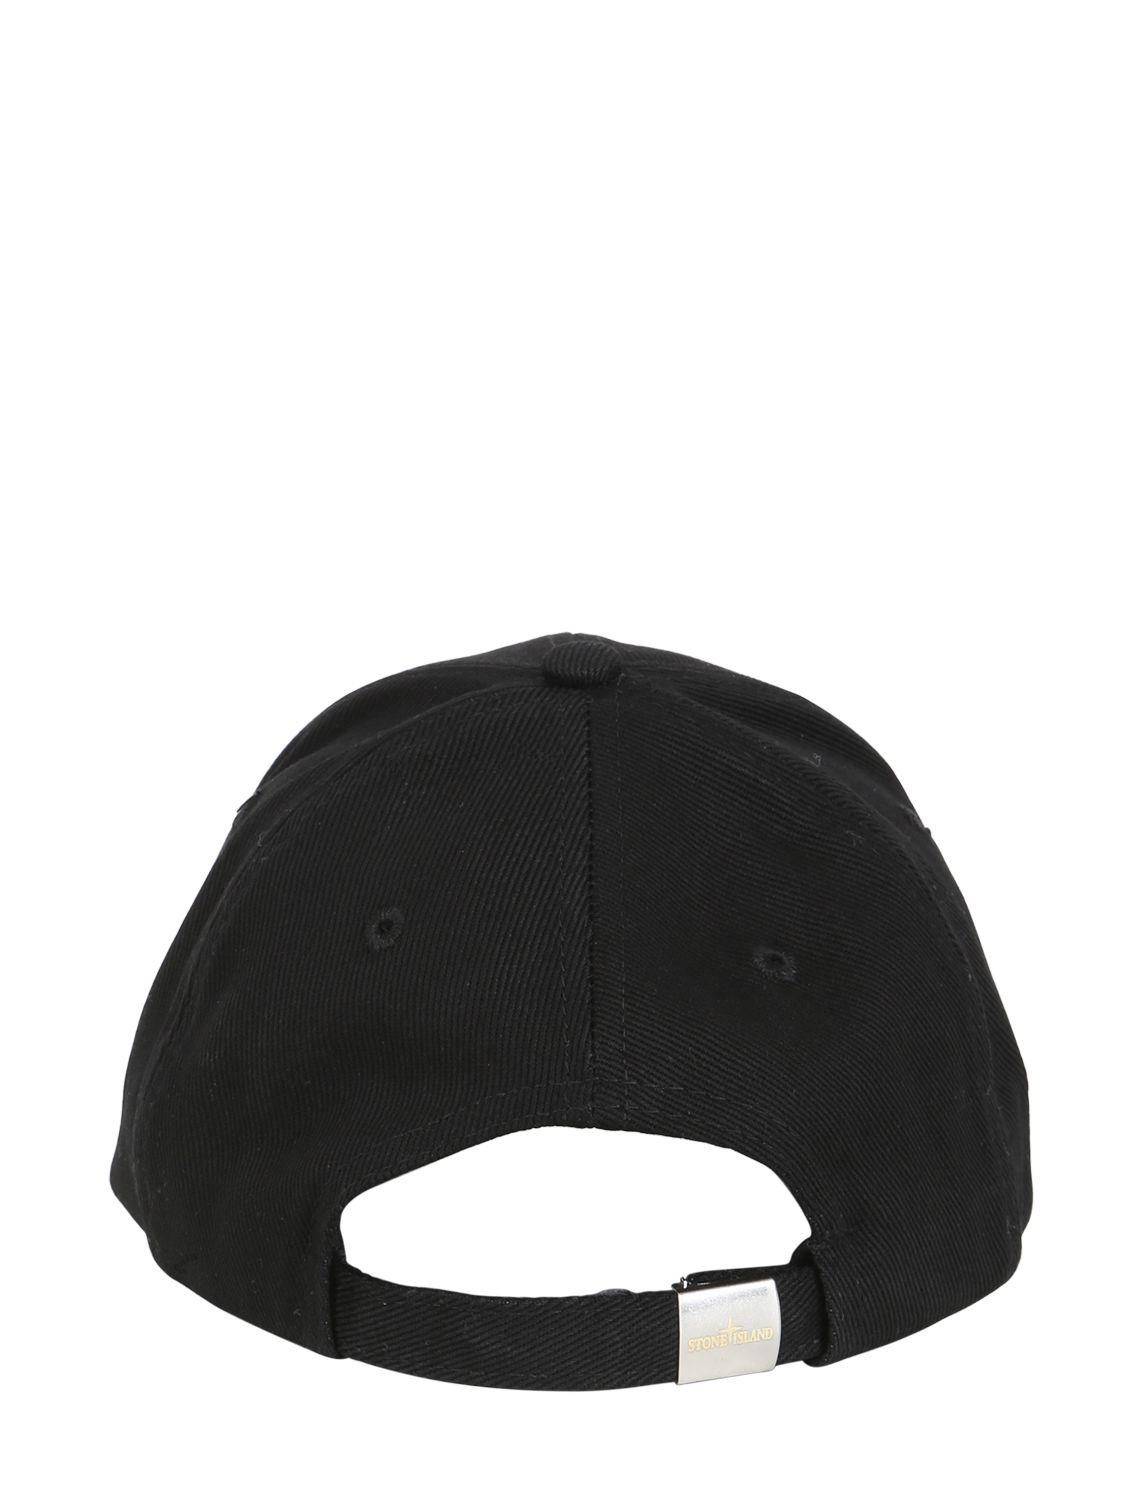 Lyst - Stone Island Cotton Gabardine Baseball Cap in Black for Men ff454a3d45a